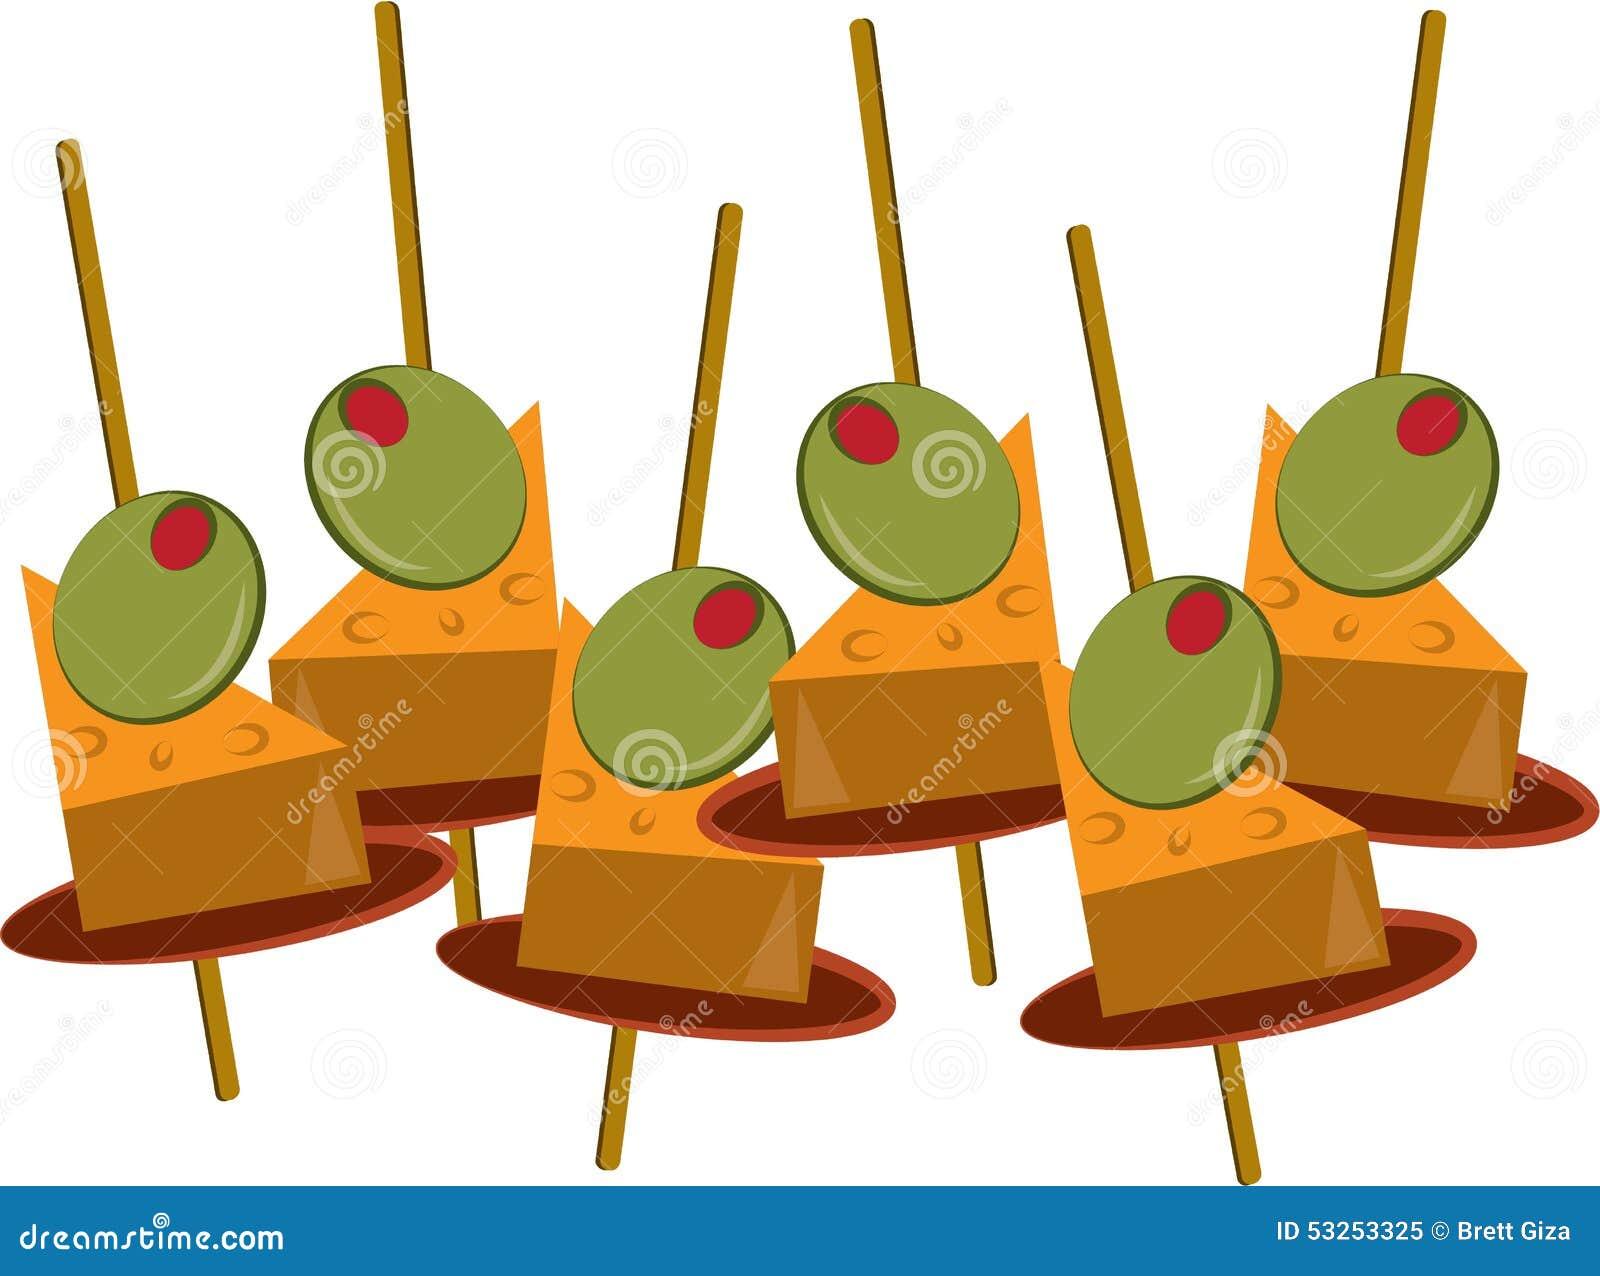 Appetizer Snack Stock Vector - Image: 53253325